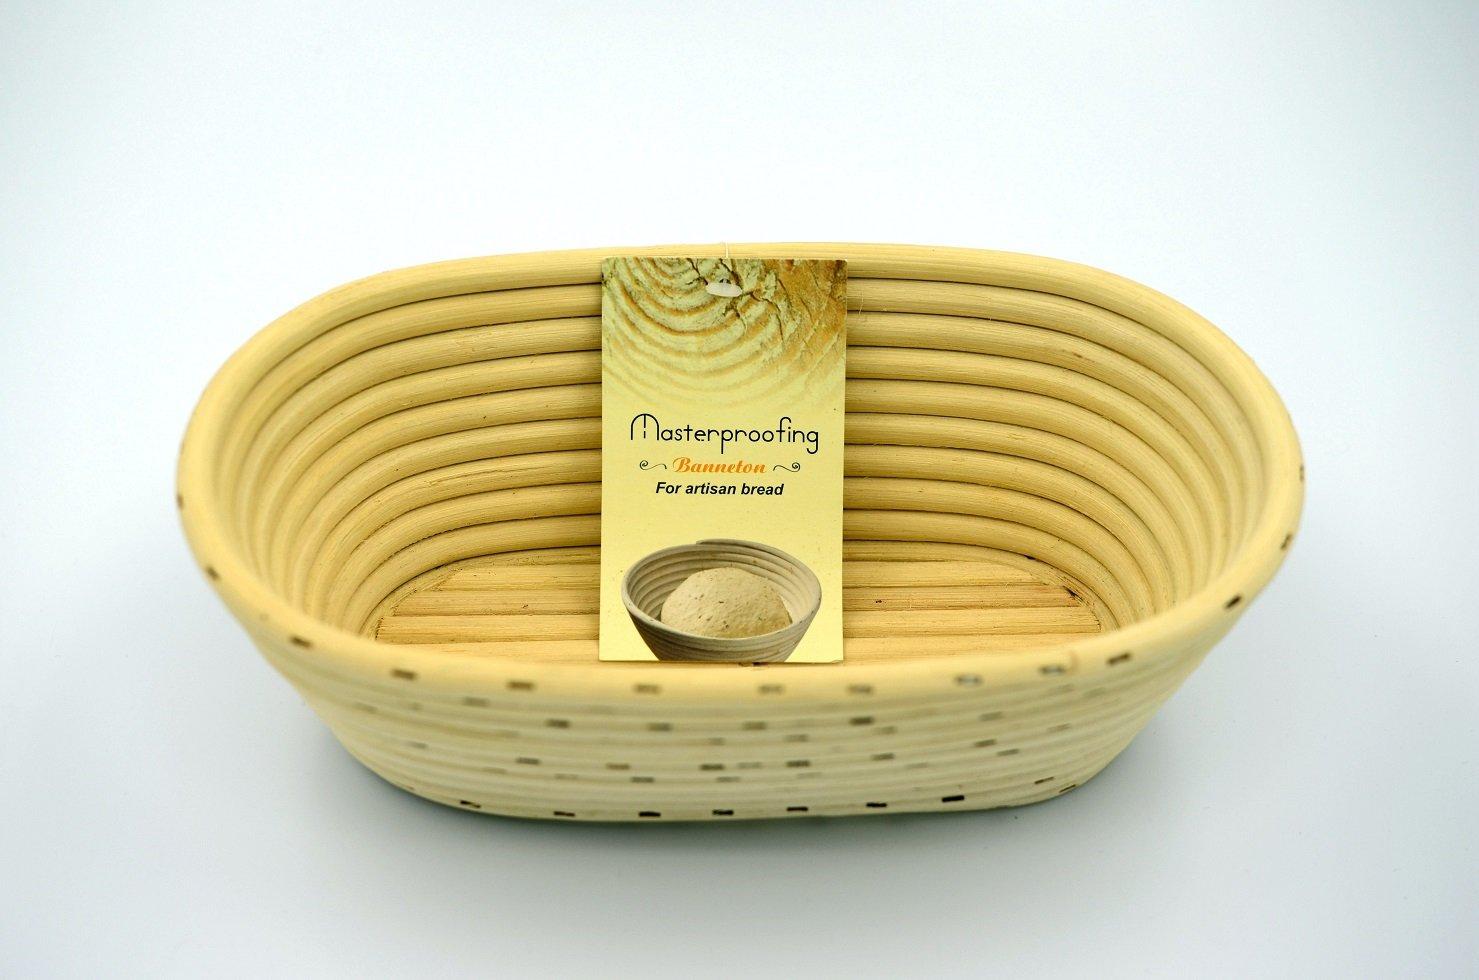 Masterproofing 2 Pcs Oval Banneton Proofing Basket(500g Dough) OB-22